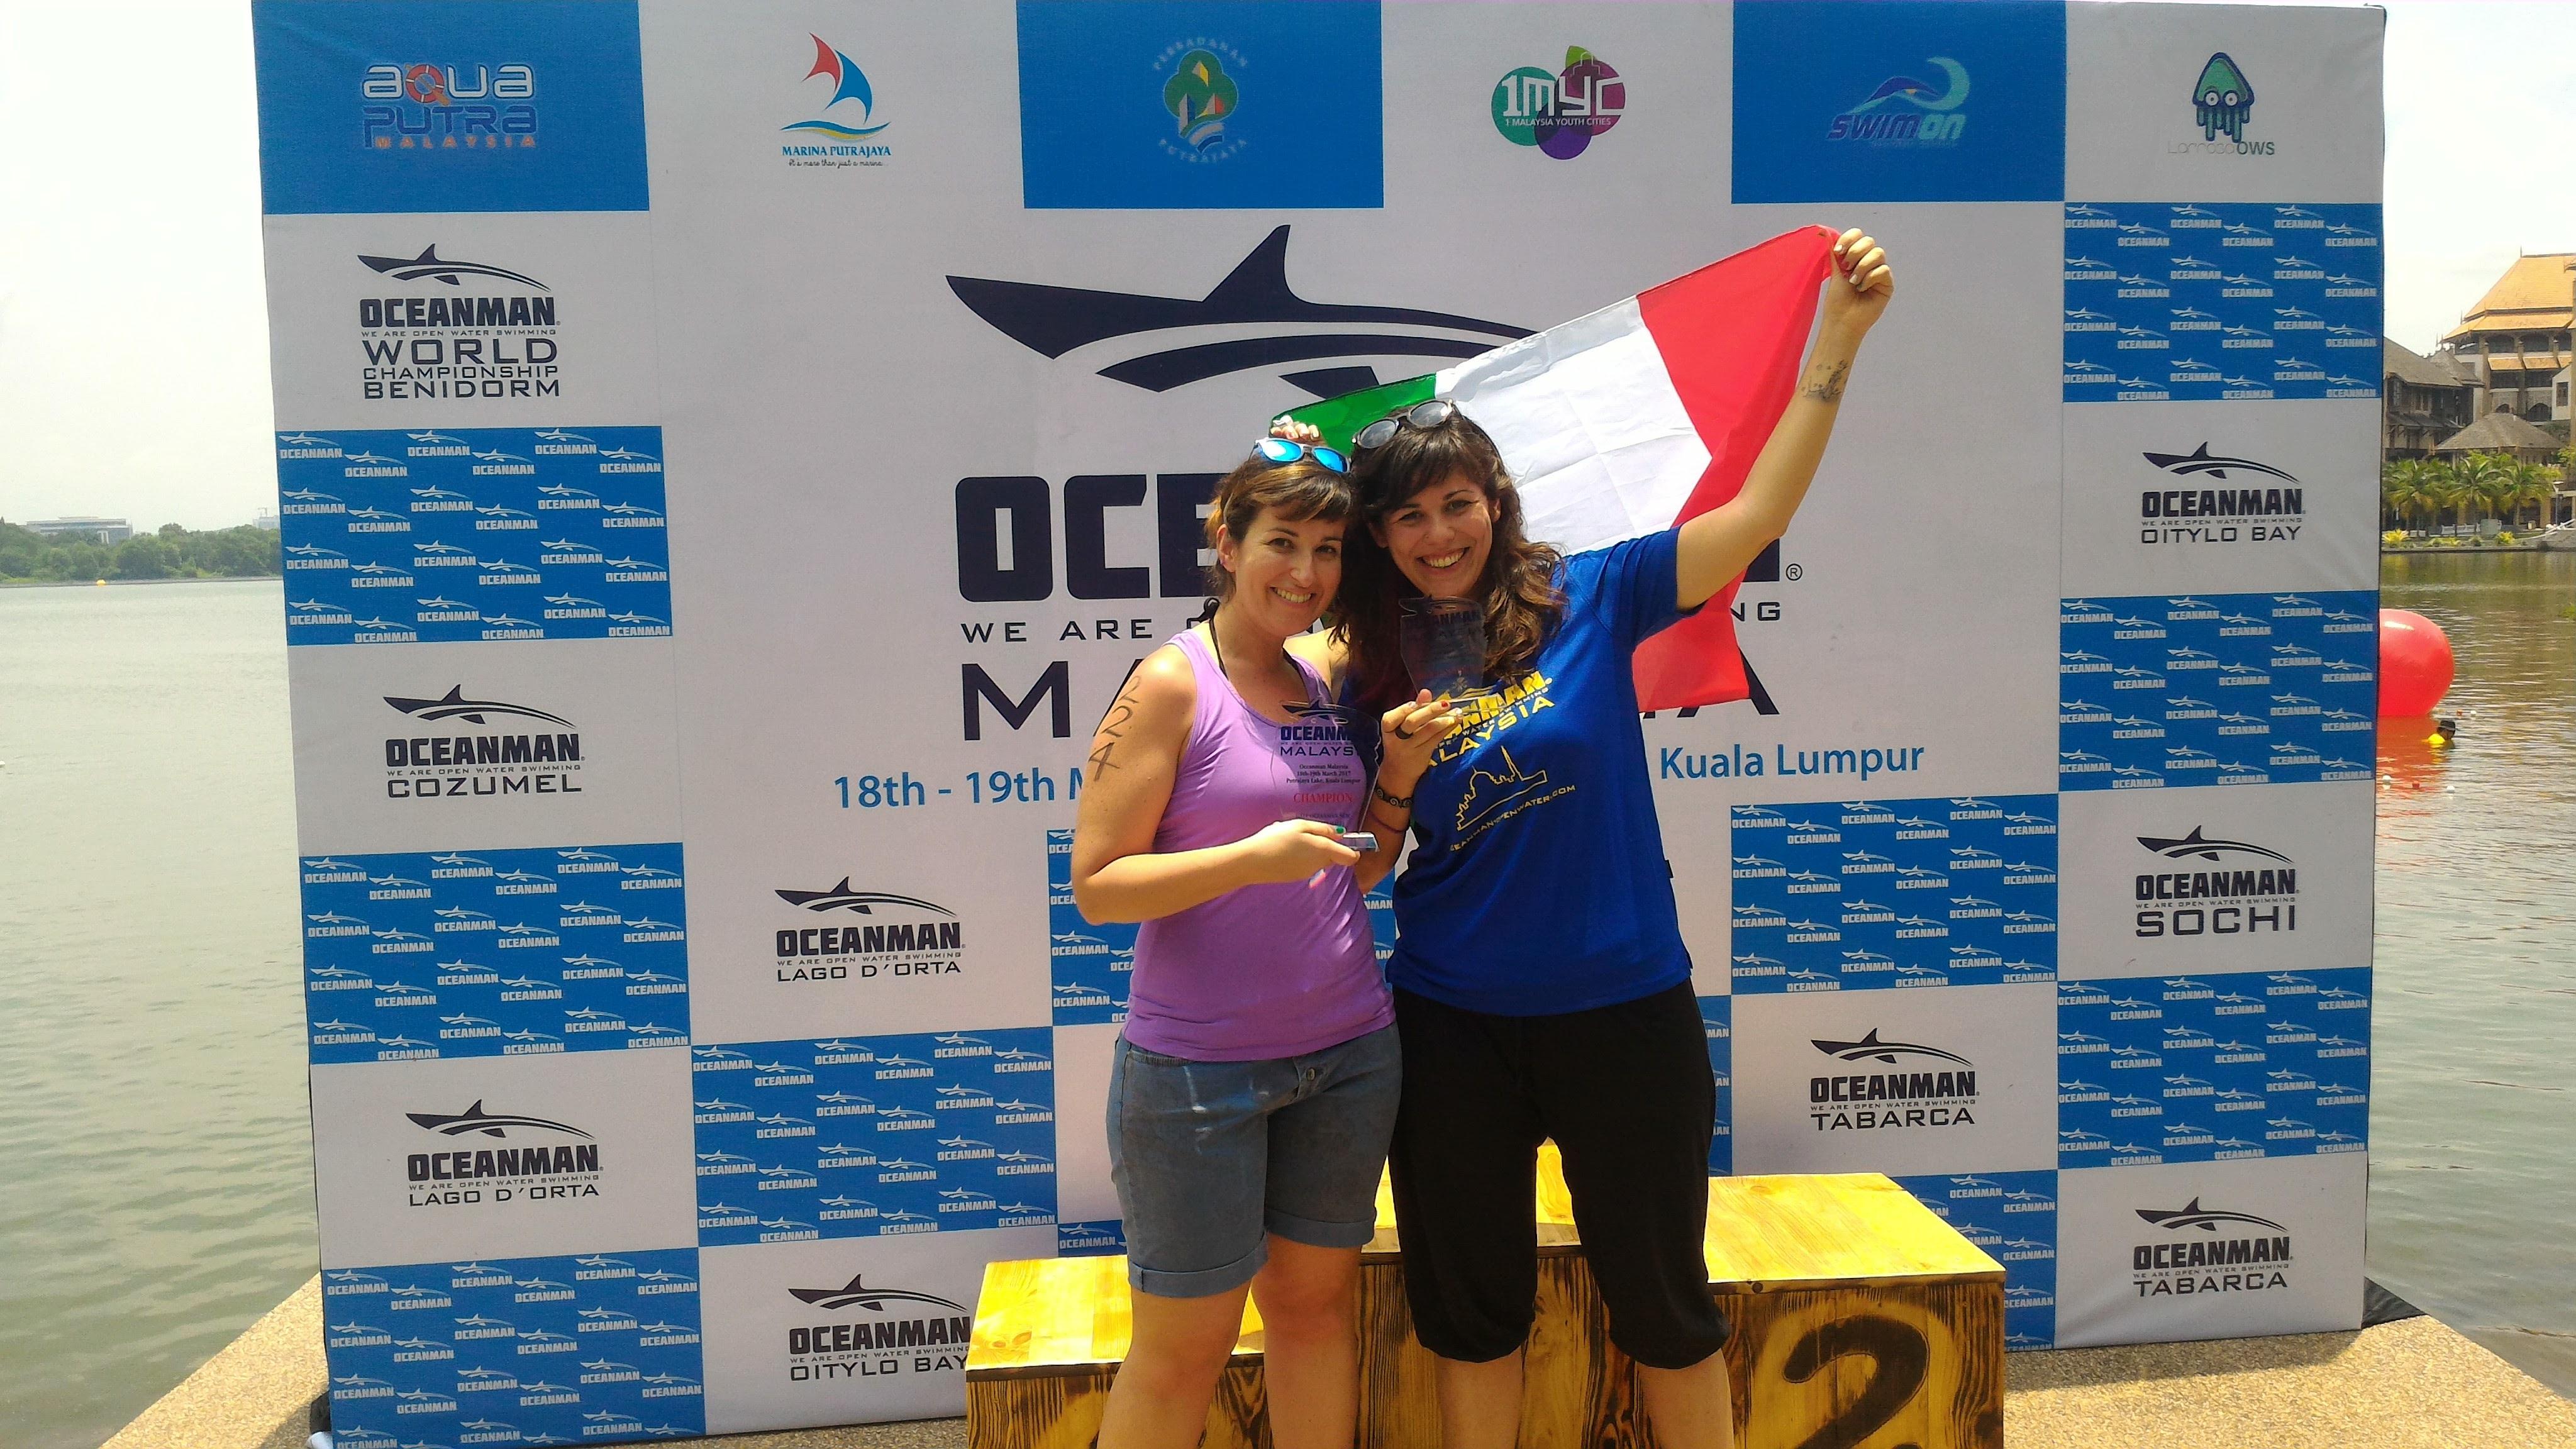 La Guida - Due cuneesi in gara nella Oceanman in Malesia